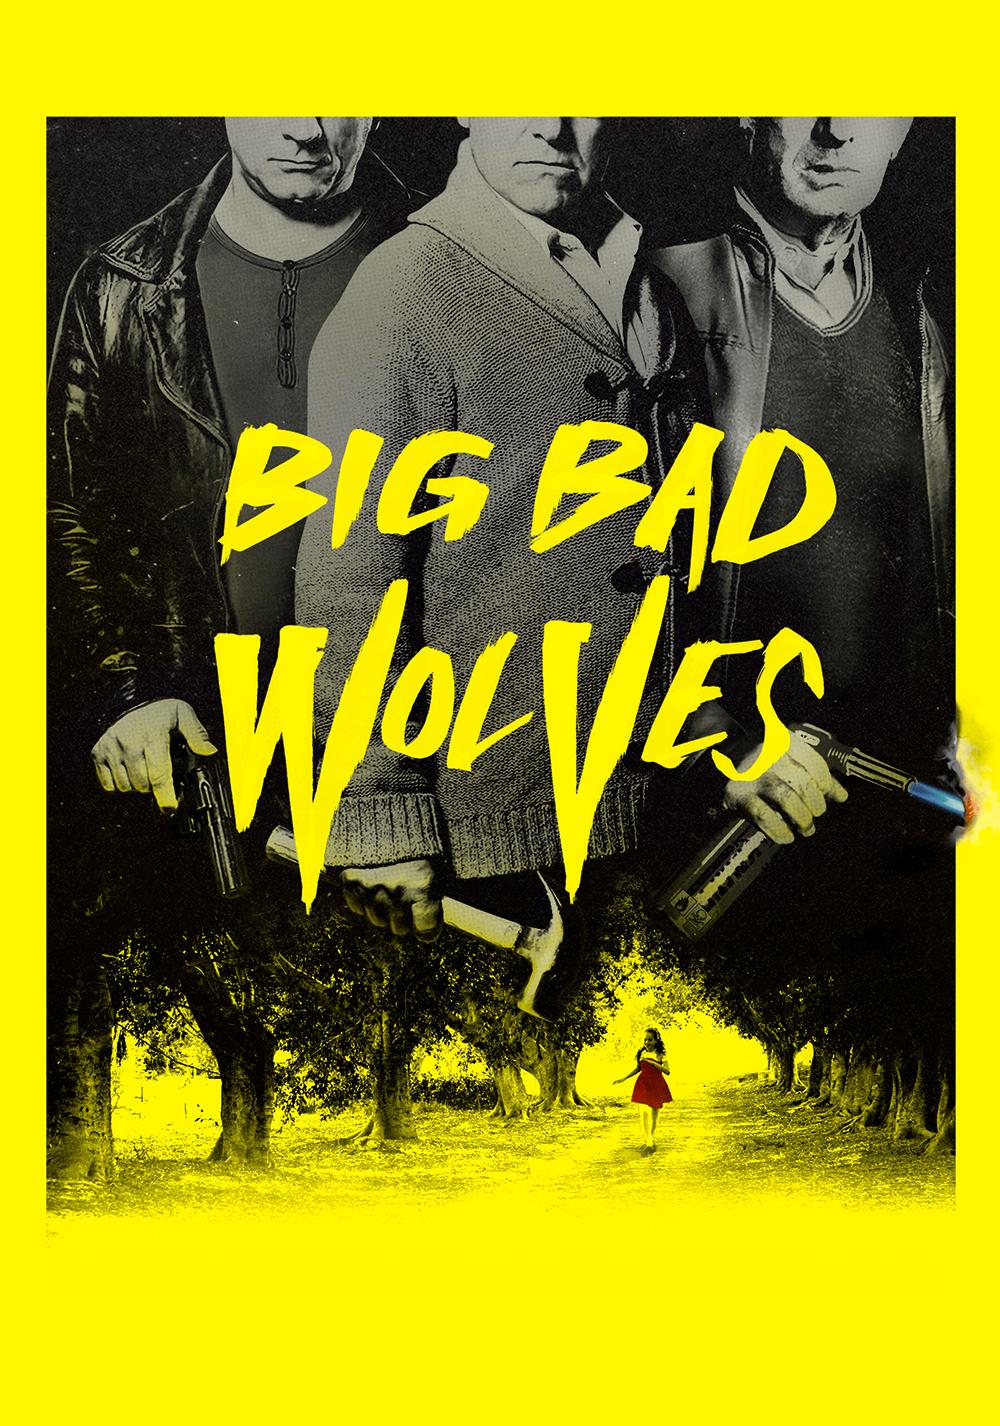 big bad wolf movie poster - photo #13